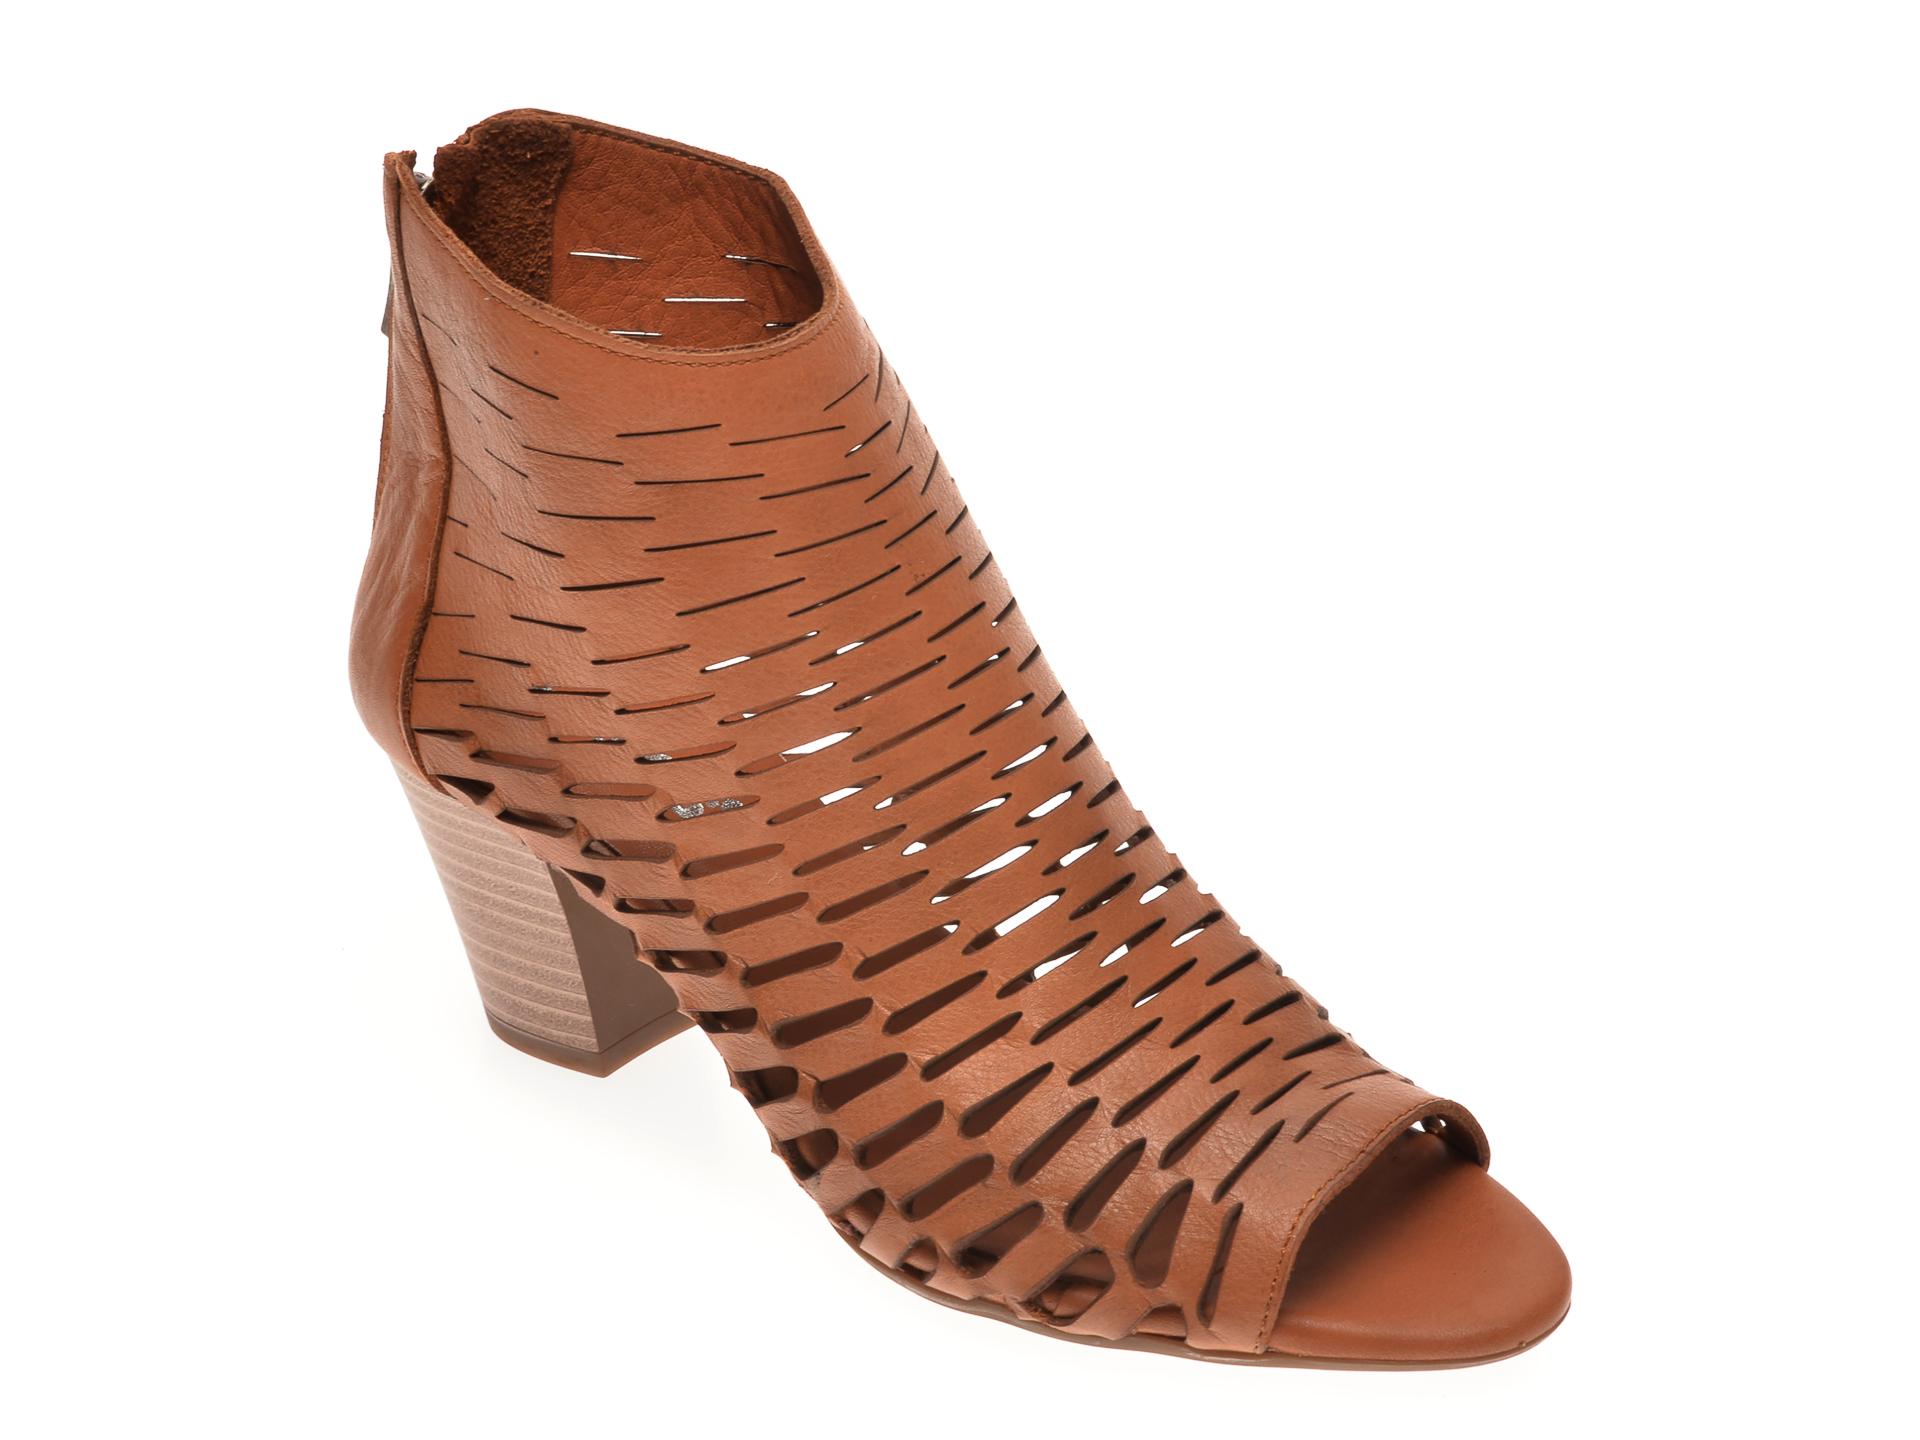 Sandale BABOOS maro, 339, din piele naturala imagine otter.ro 2021